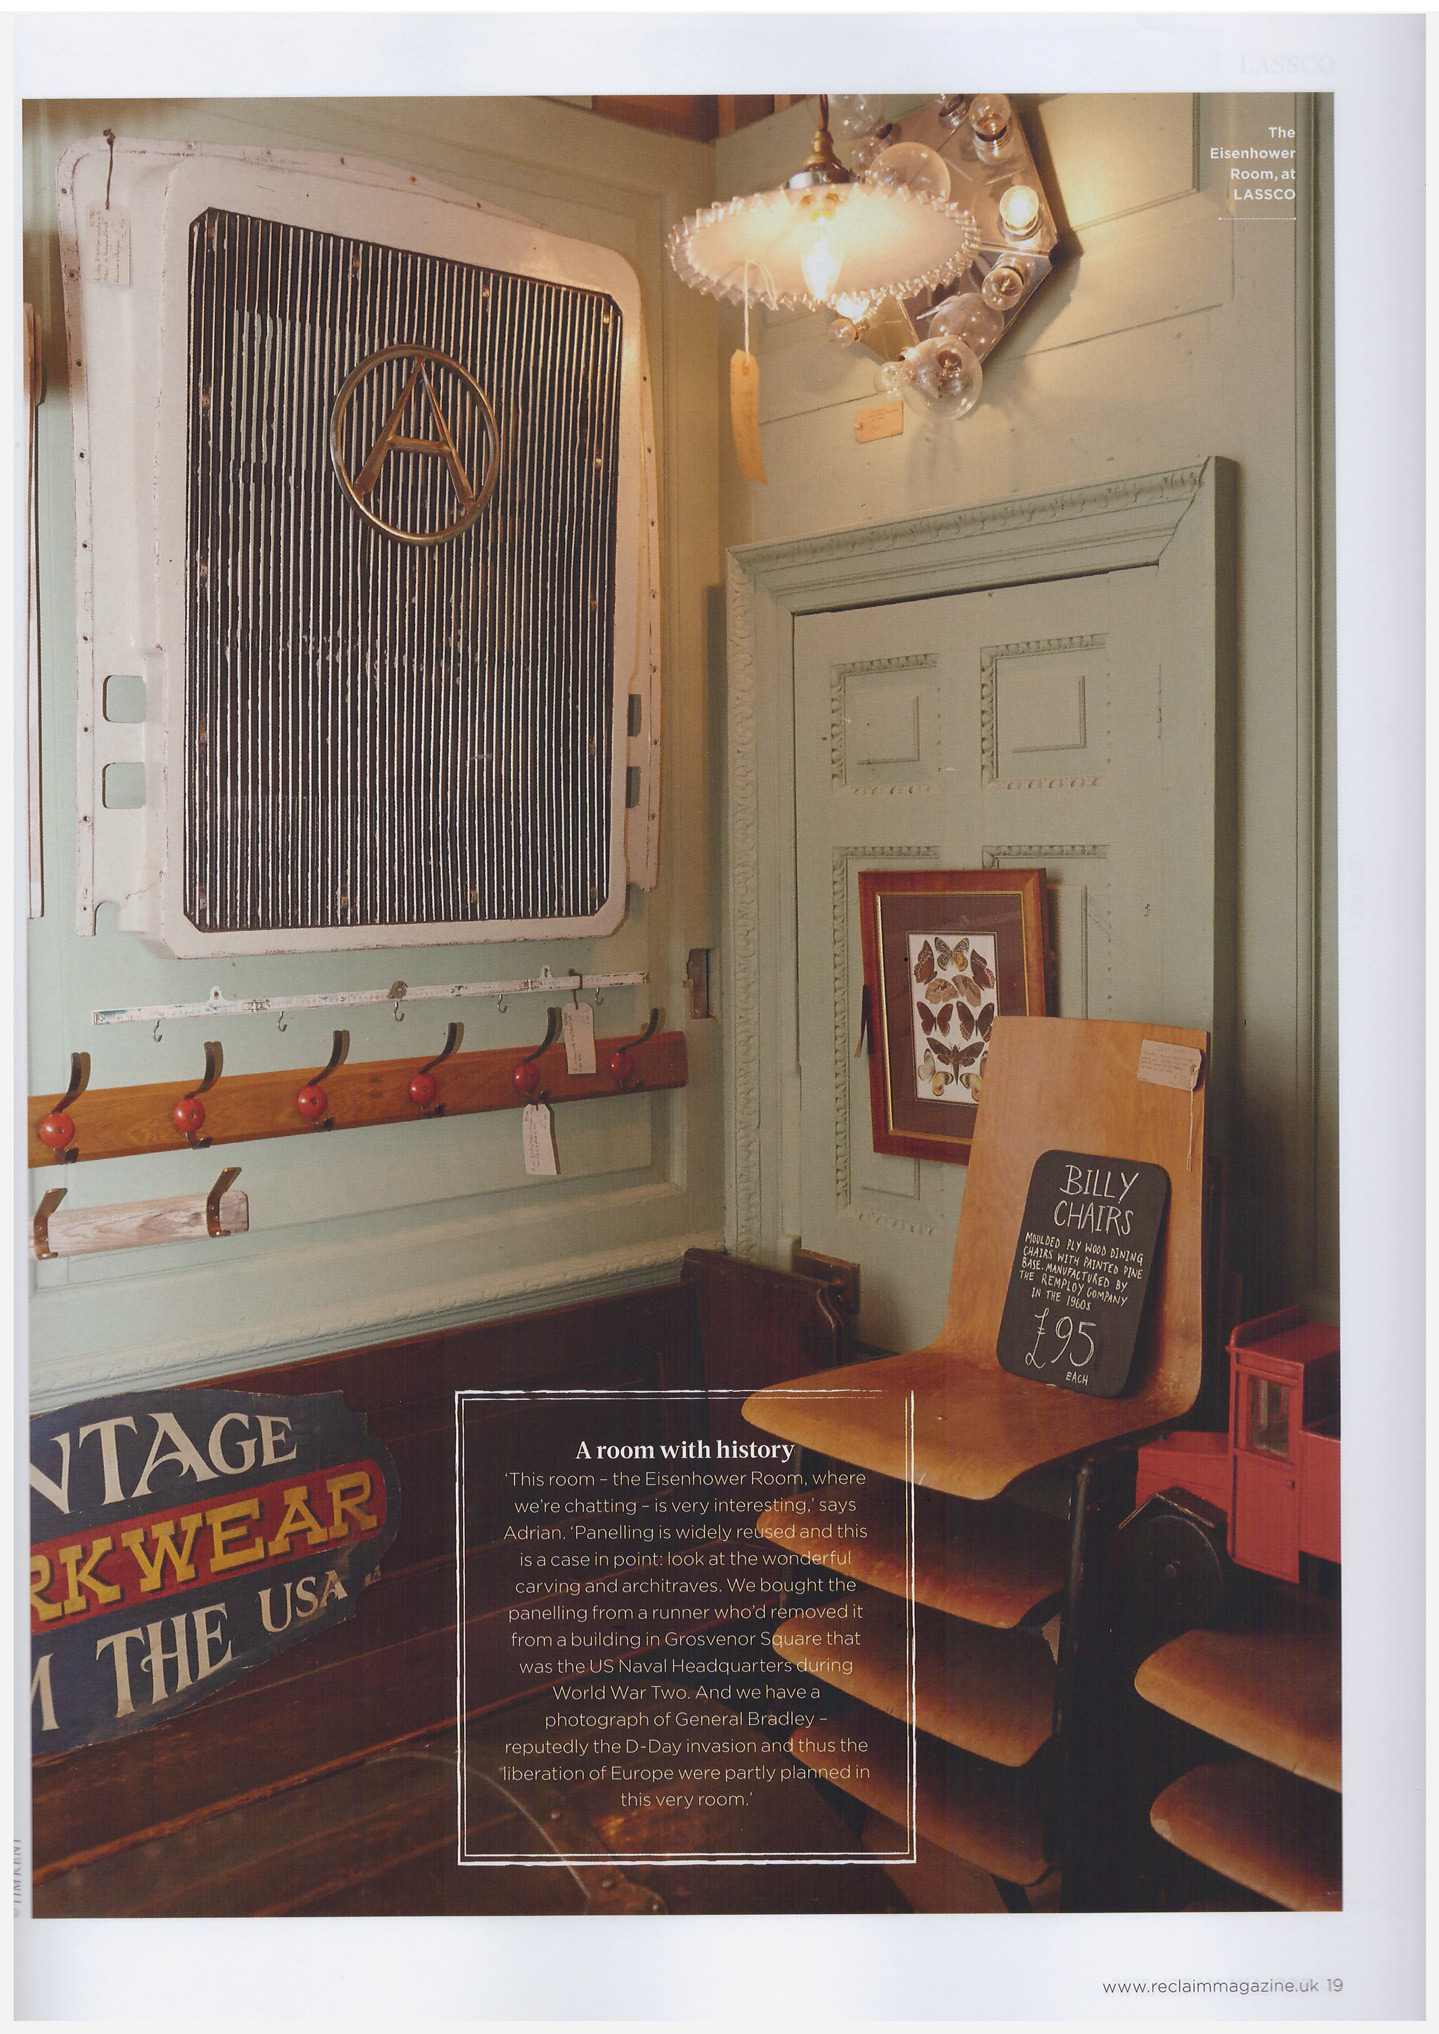 Reclaim-magazine-pg-19-web